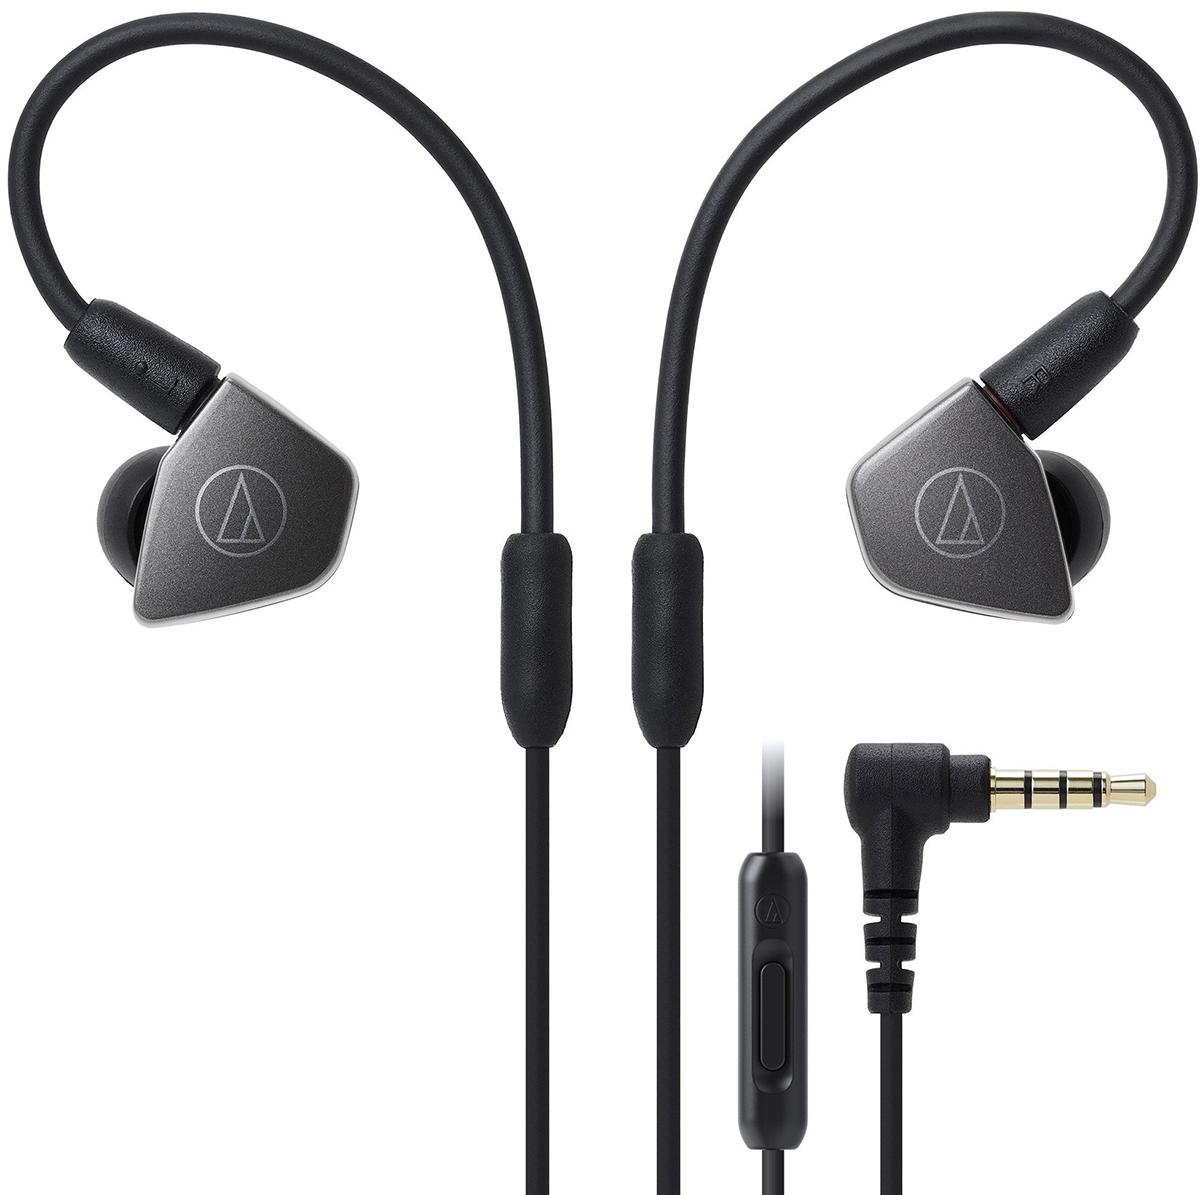 Audio-Technica ATH-LS70iS (15119539) - внутриканальные наушники (Black) внутриканальные наушники audio technica ath sport1is pink